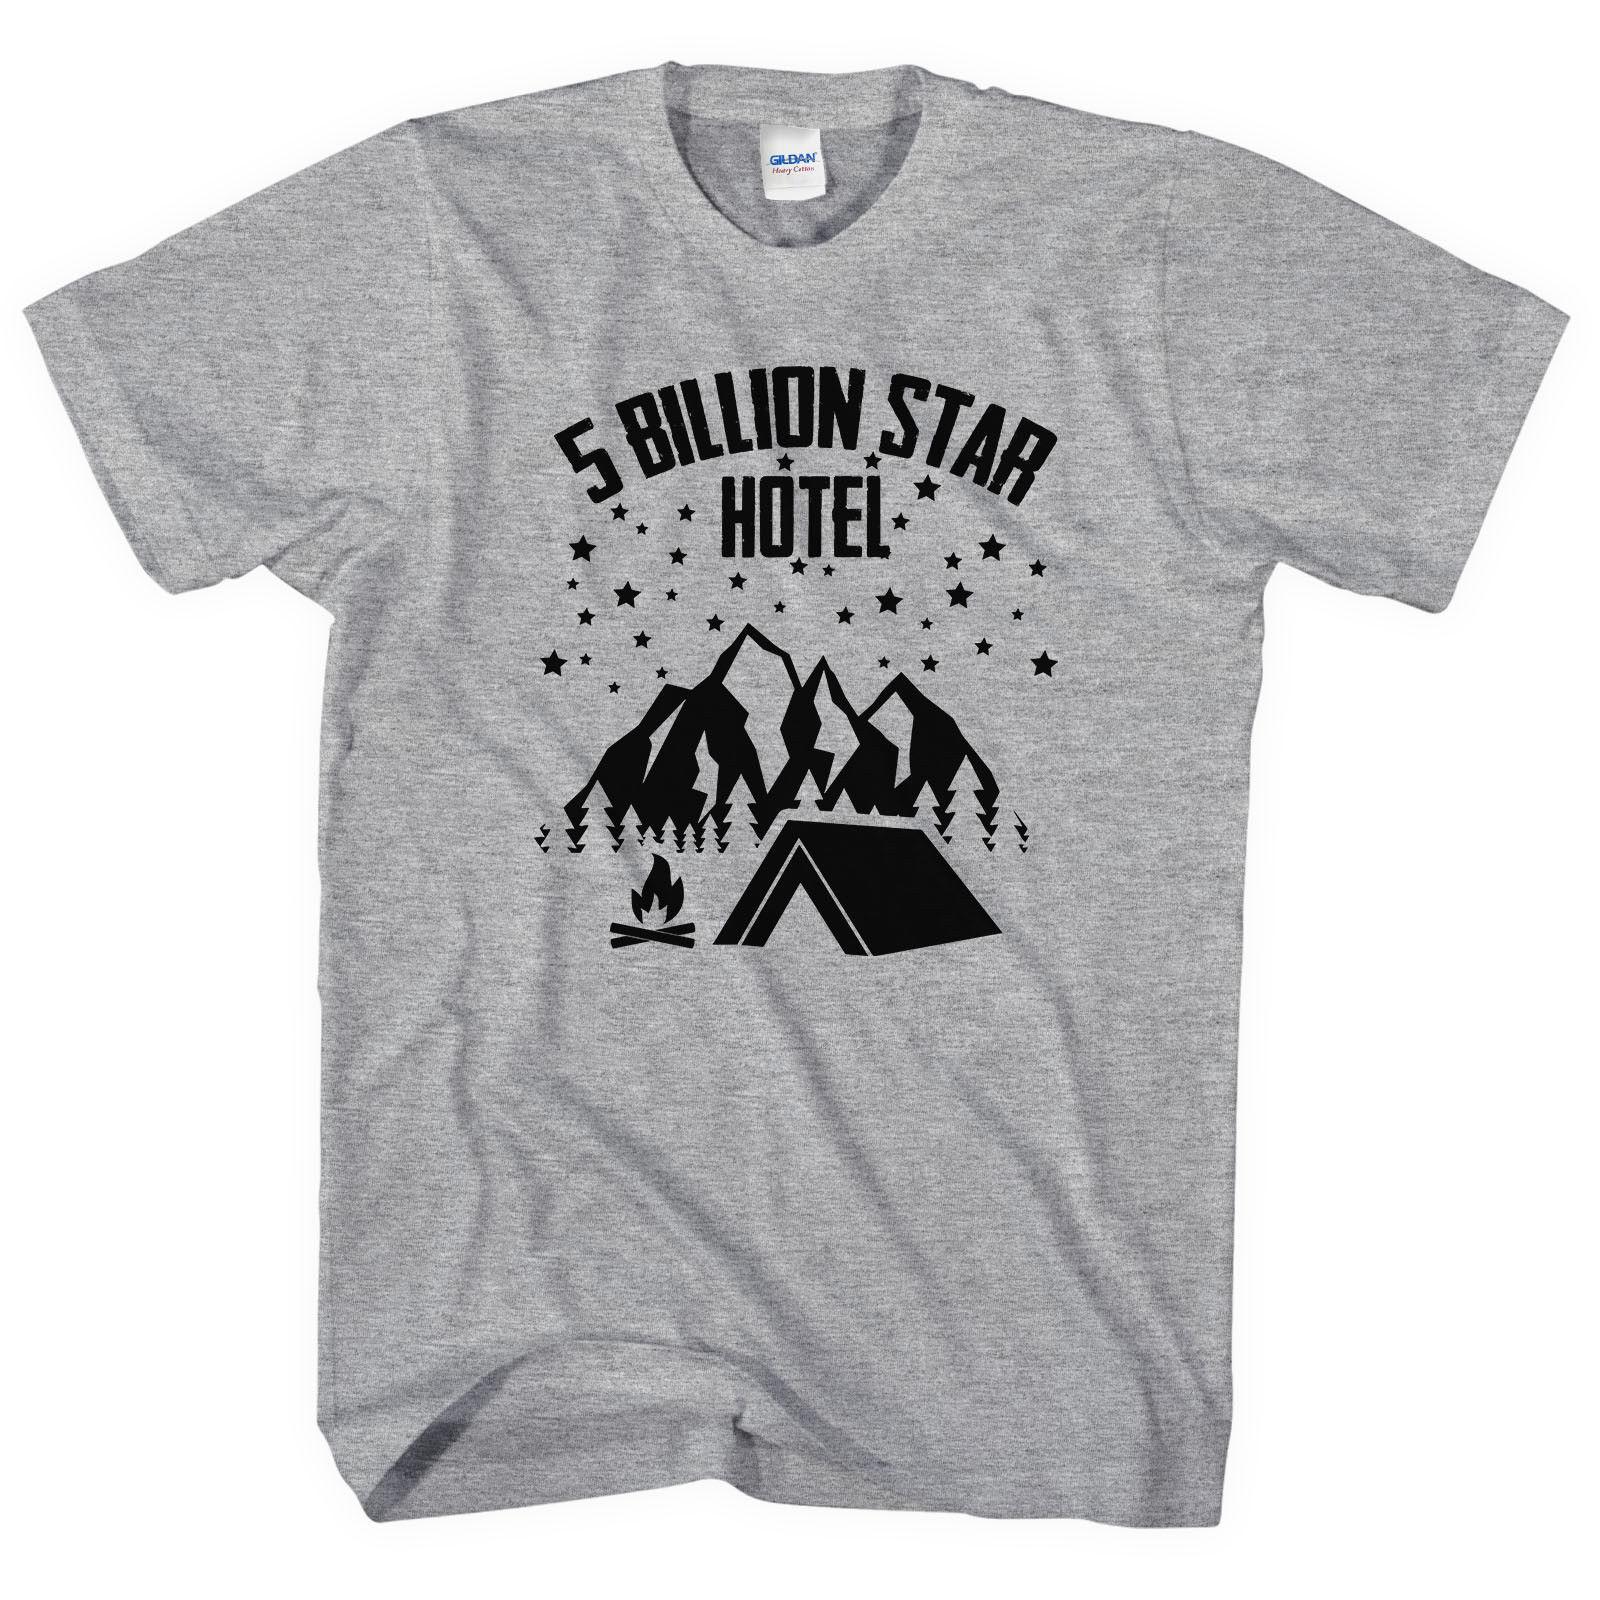 8f4003df75 Camping T-Shirt 5 Billion Star Hotel Scout Camp Estate Uomo Donna Bambino  Tshirt L230 UK Camicie di marca jeans Stampa